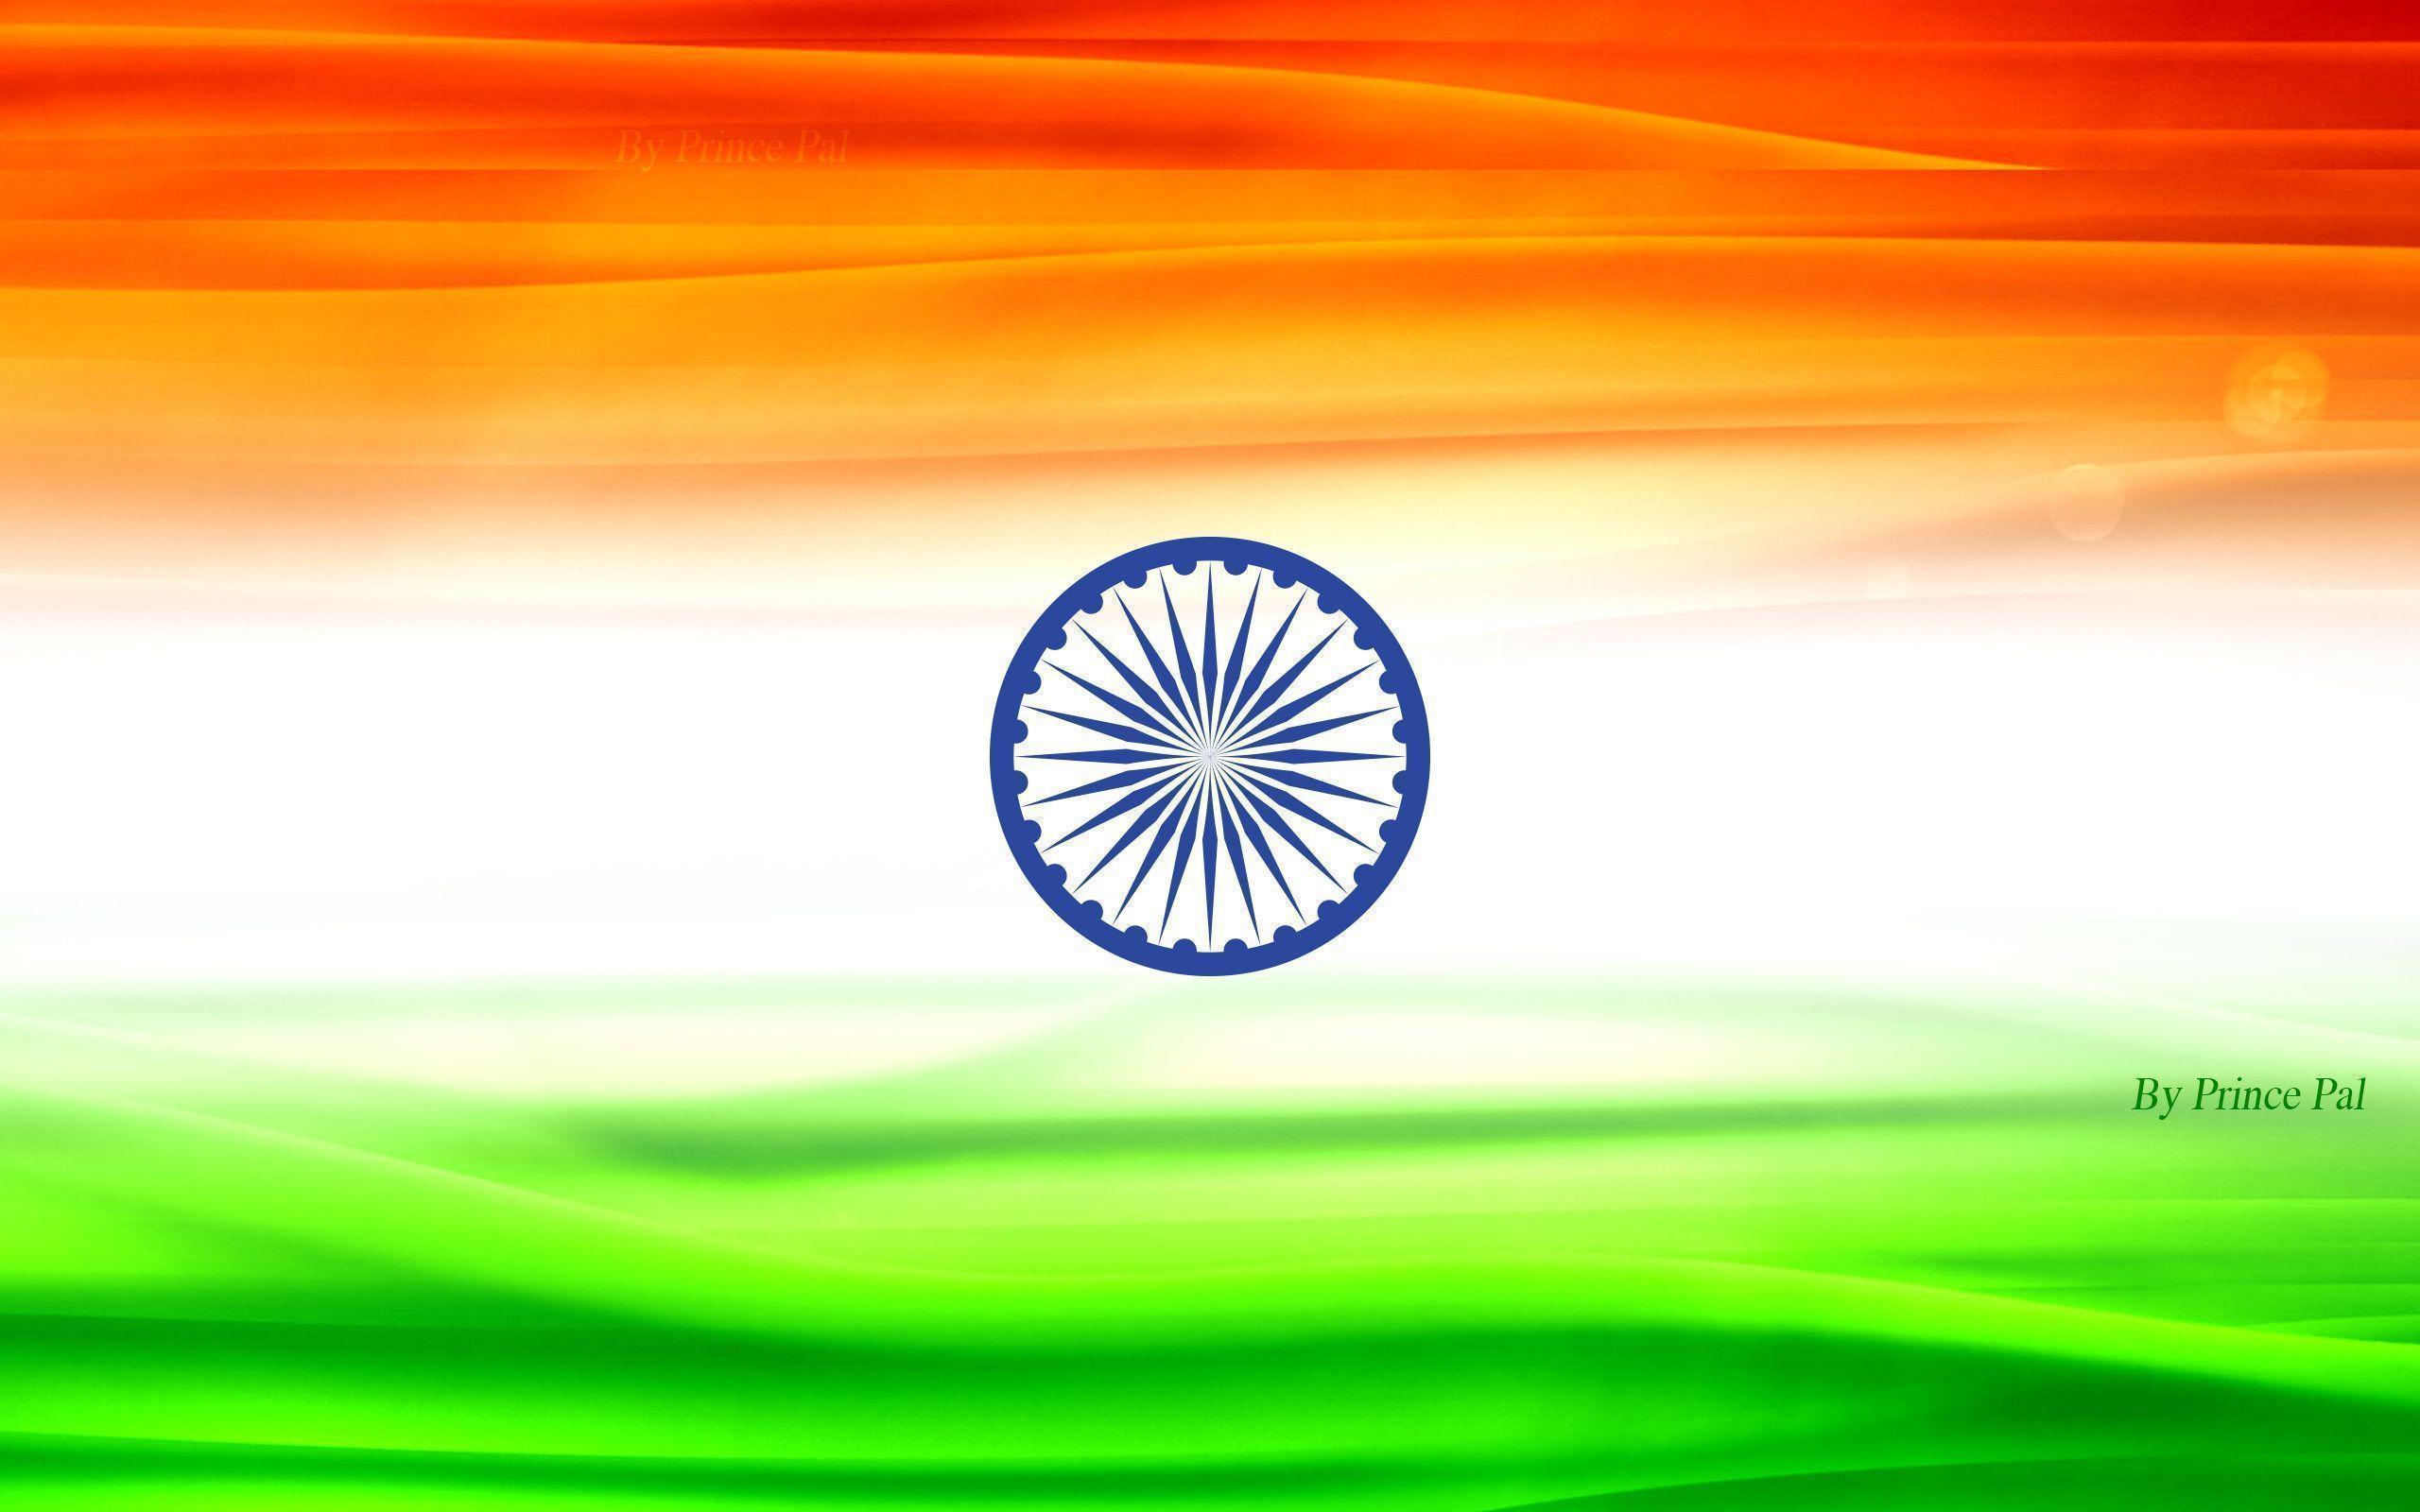 Indian Flag 4k Wallpaper: Indian Flag Wallpapers 2015